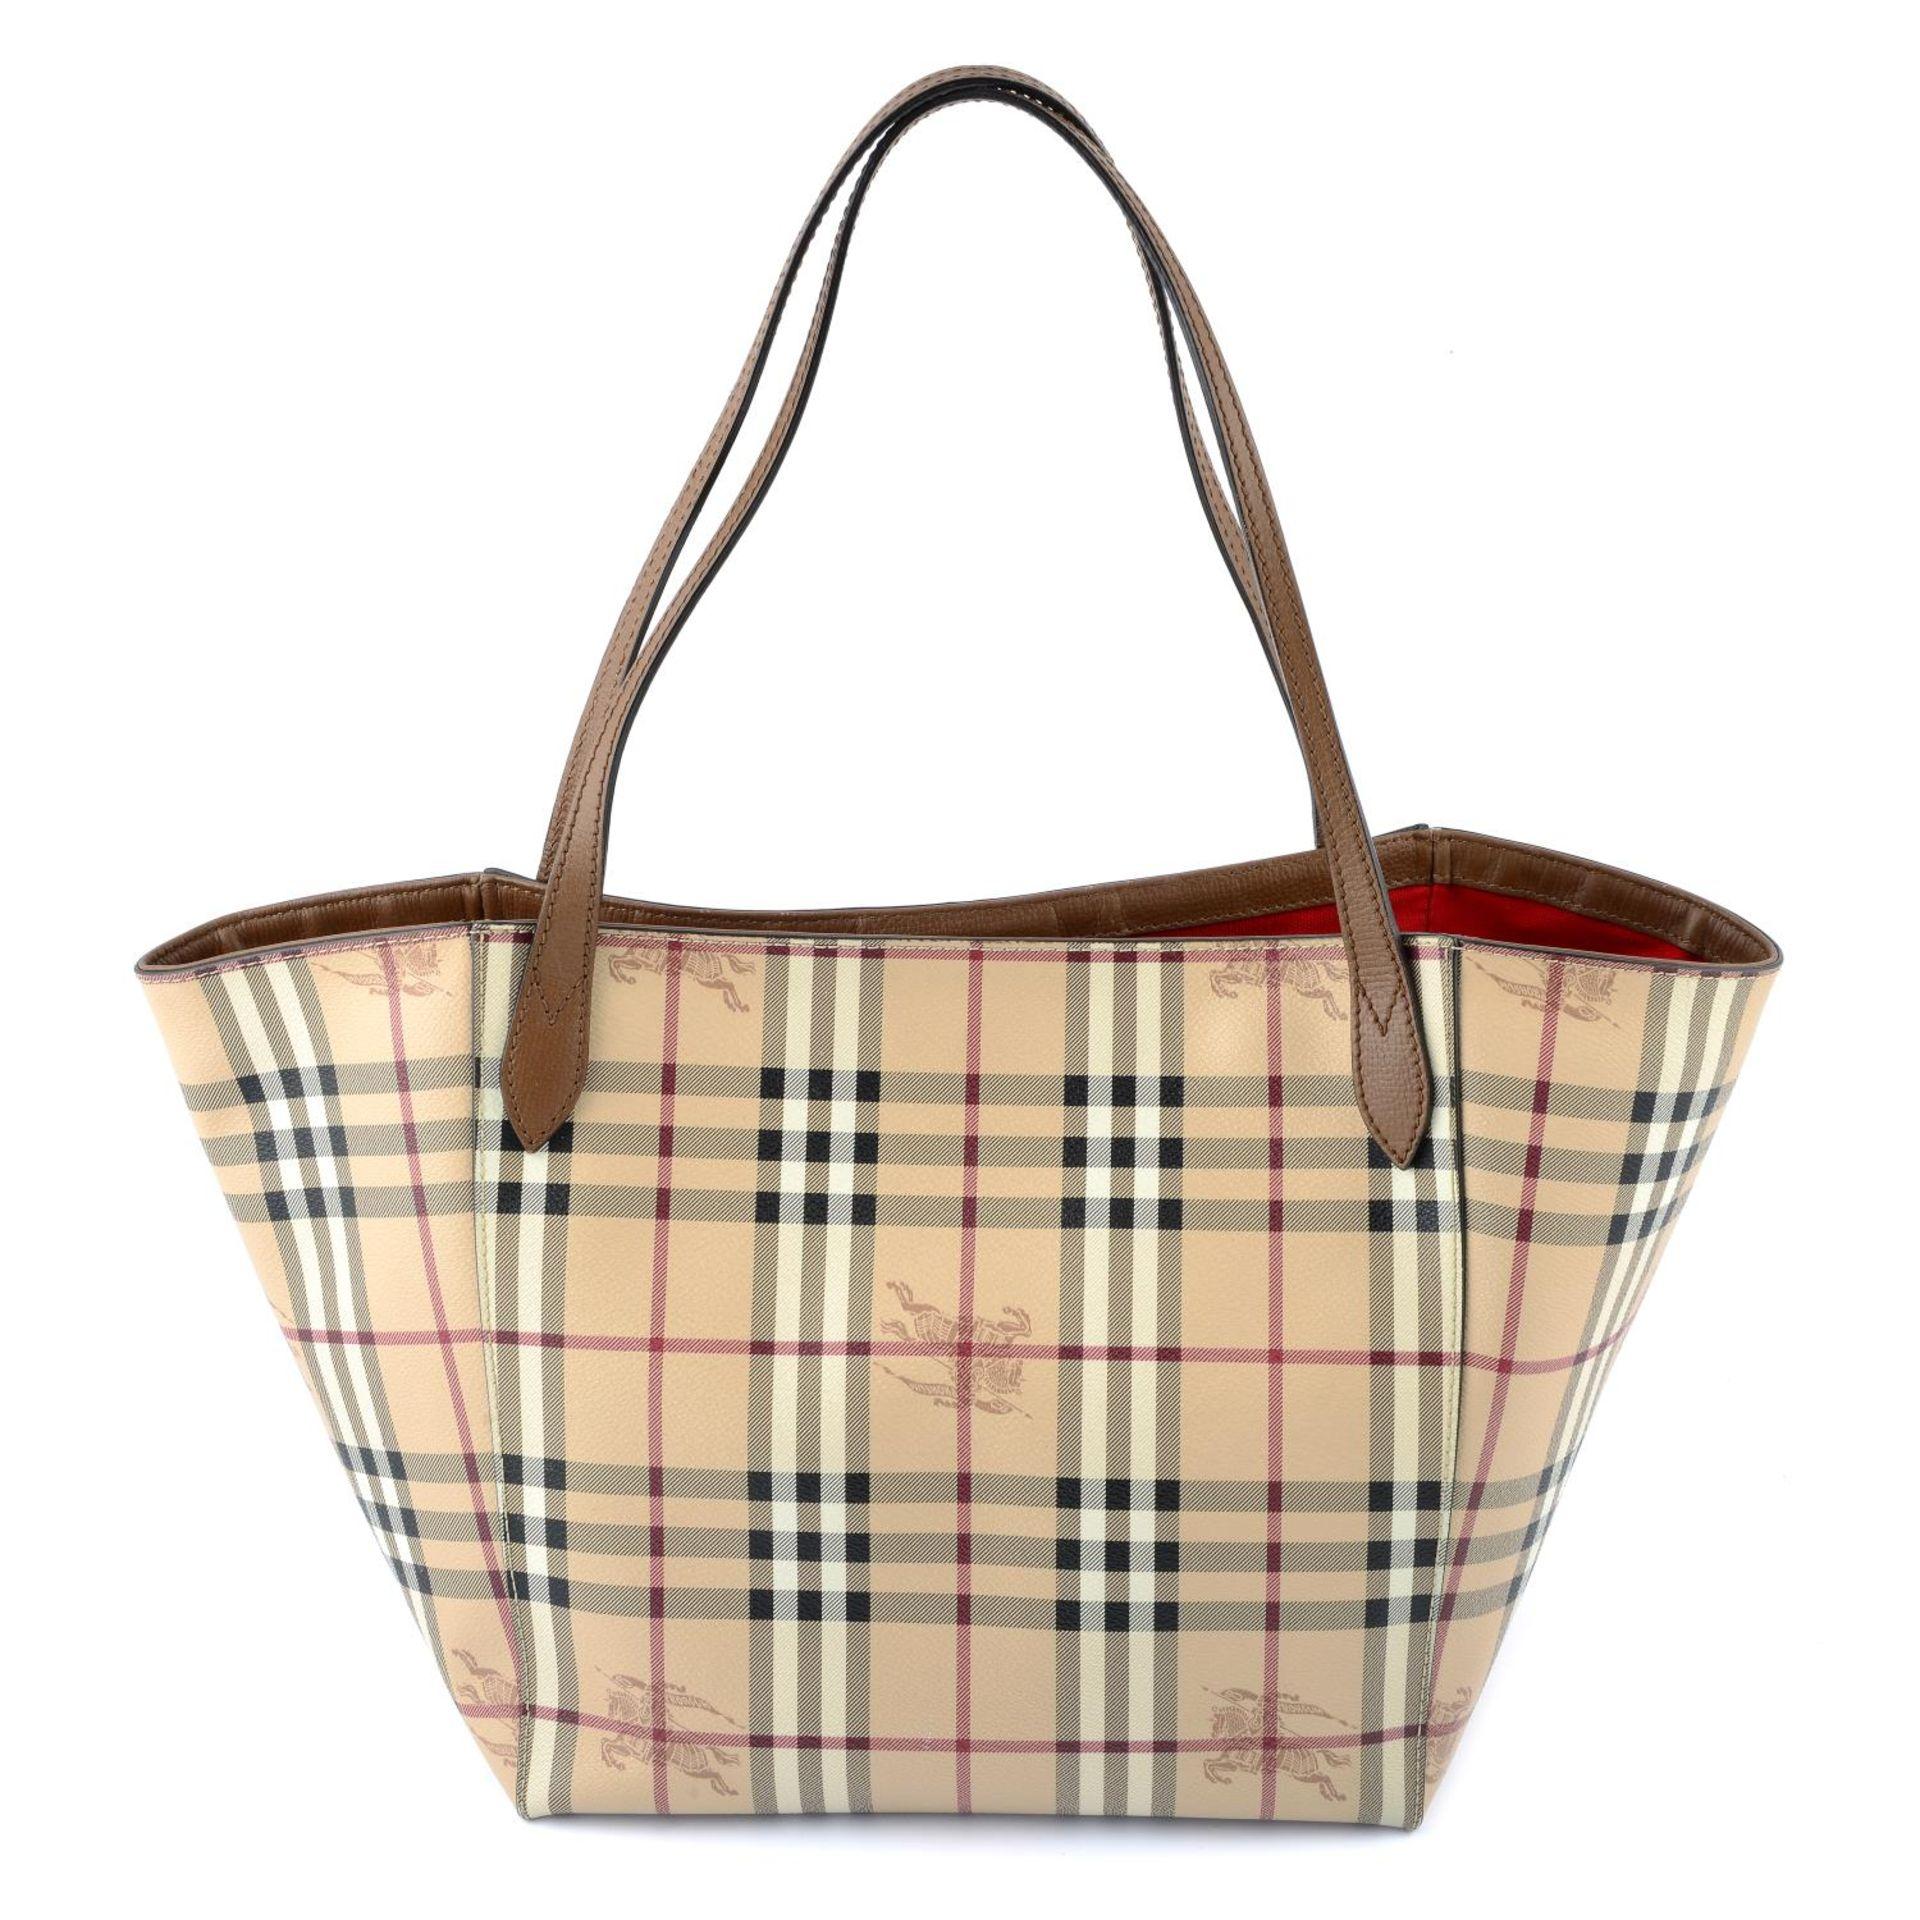 BURBERRY - a Haymarket Check handbag. - Image 2 of 4